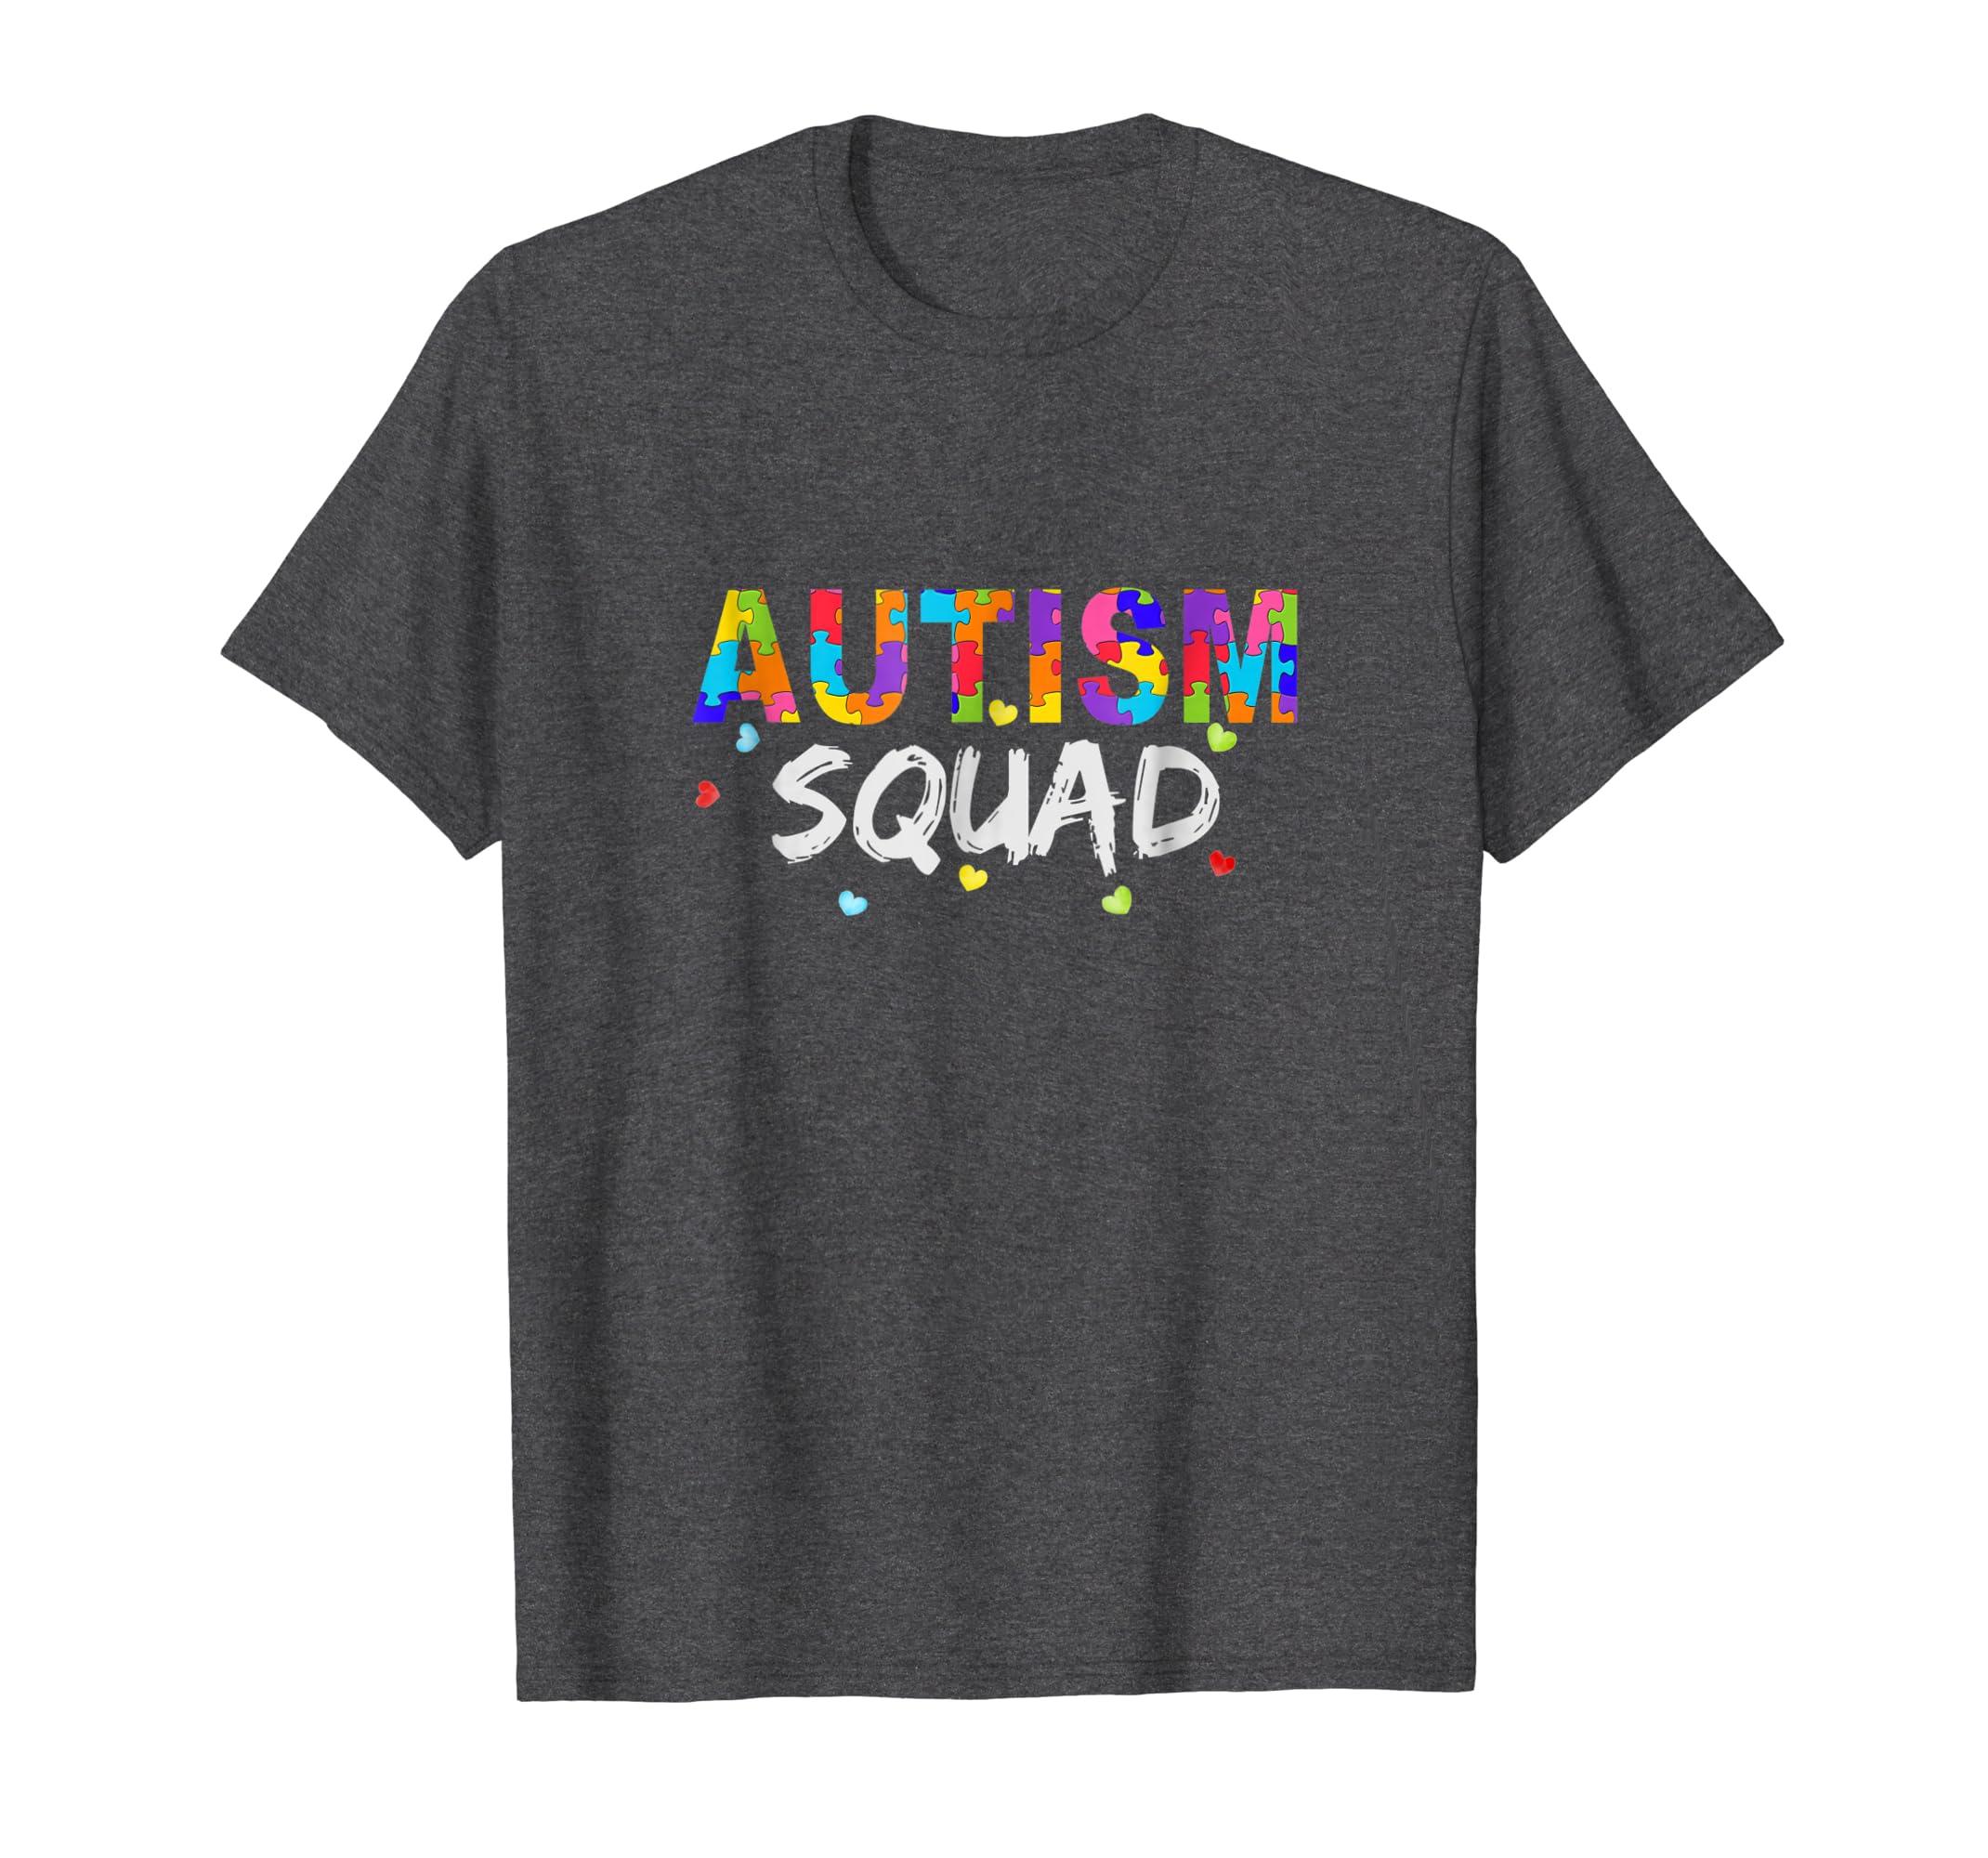 Autism Awareness Shirts Autism Squad Support Team